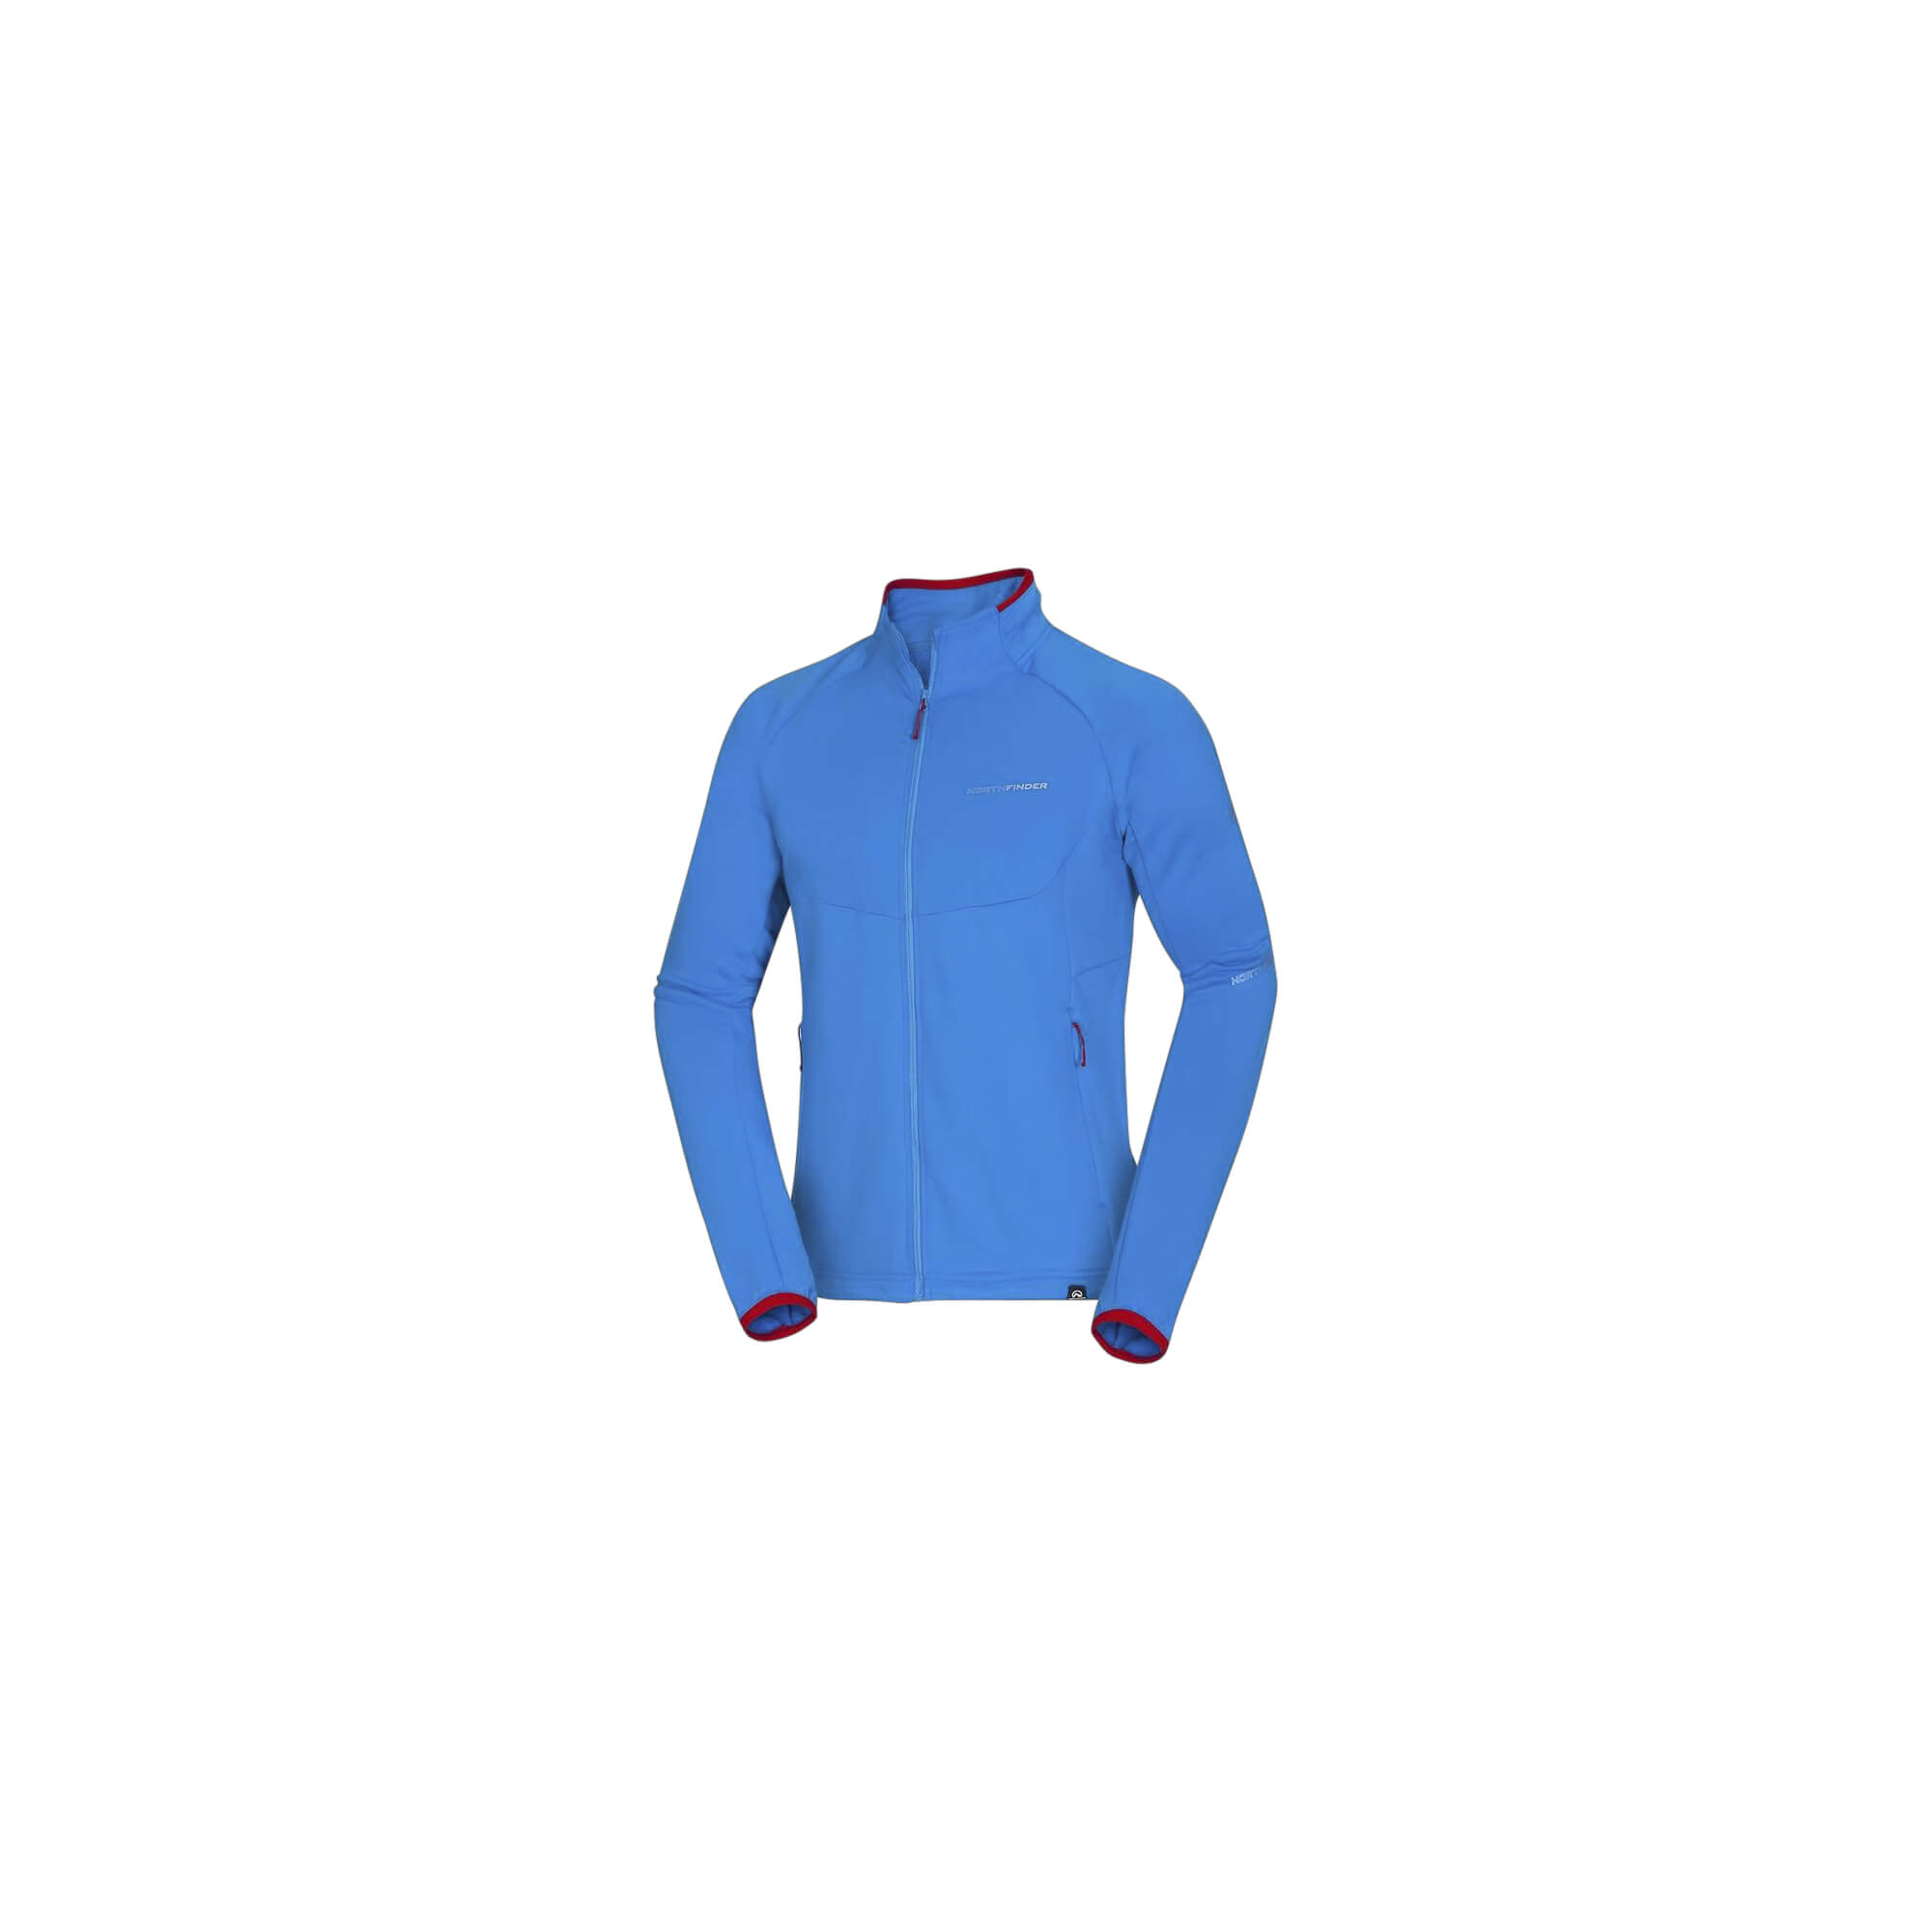 Jacheta fleece pentru barbati imagine produs